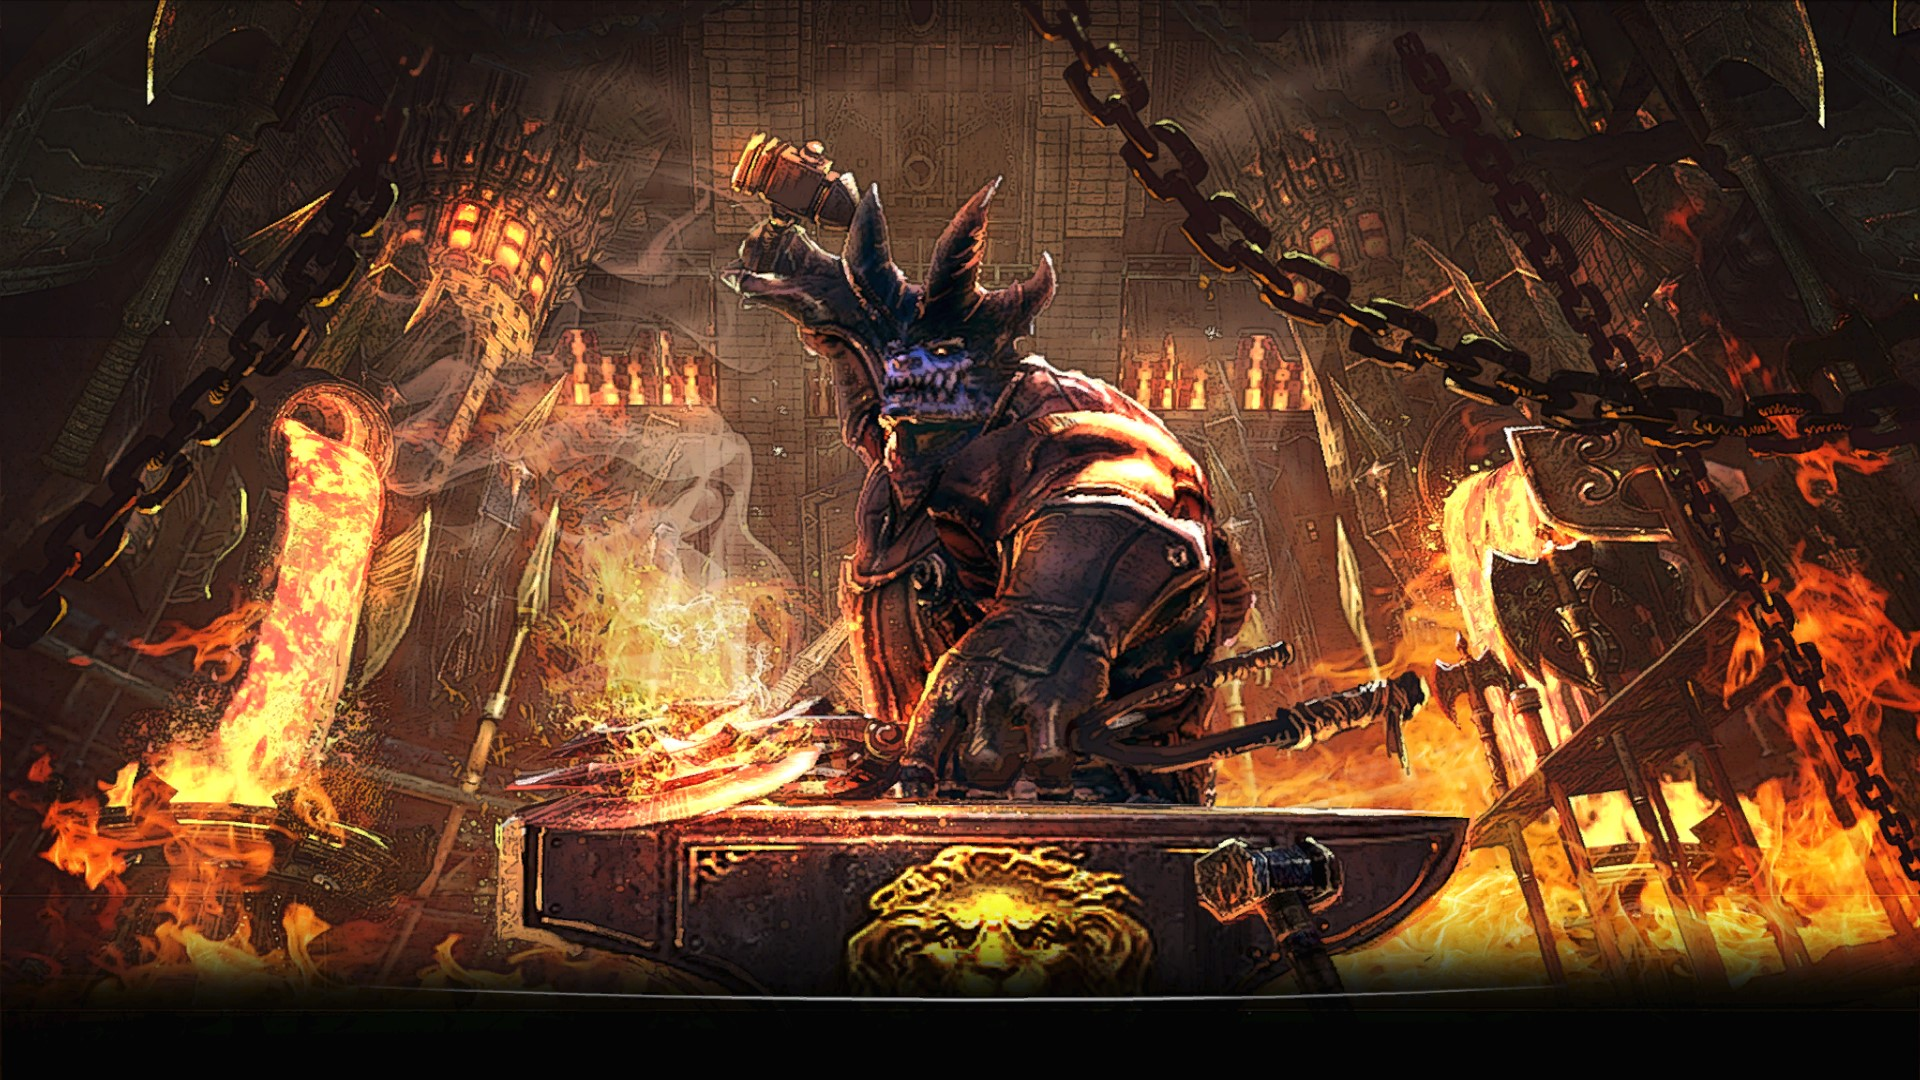 TERA ONLINE fantasy adventure game (106) wallpaper | 1920x1080 | 212171 | WallpaperUP